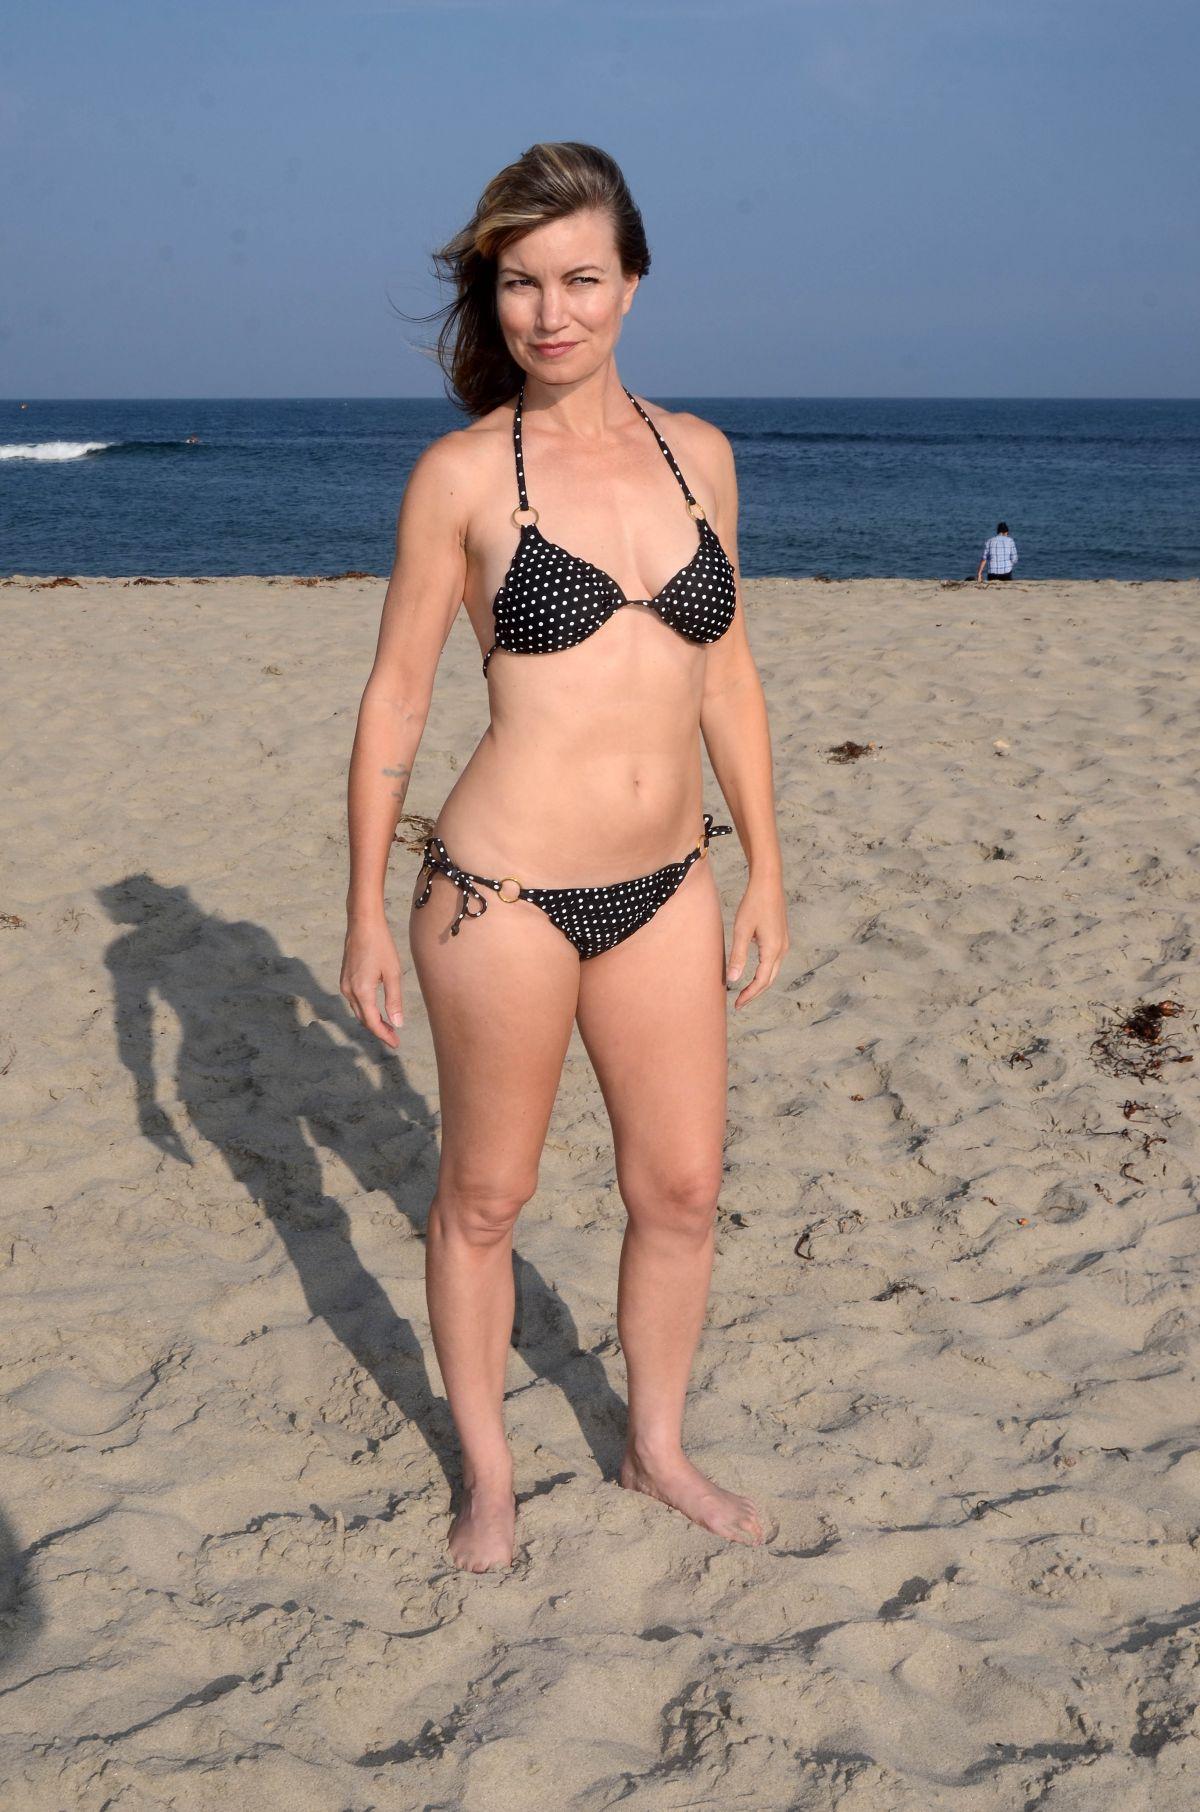 Bikini Rena Riffel naked (77 photos), Ass, Sideboobs, Selfie, legs 2020